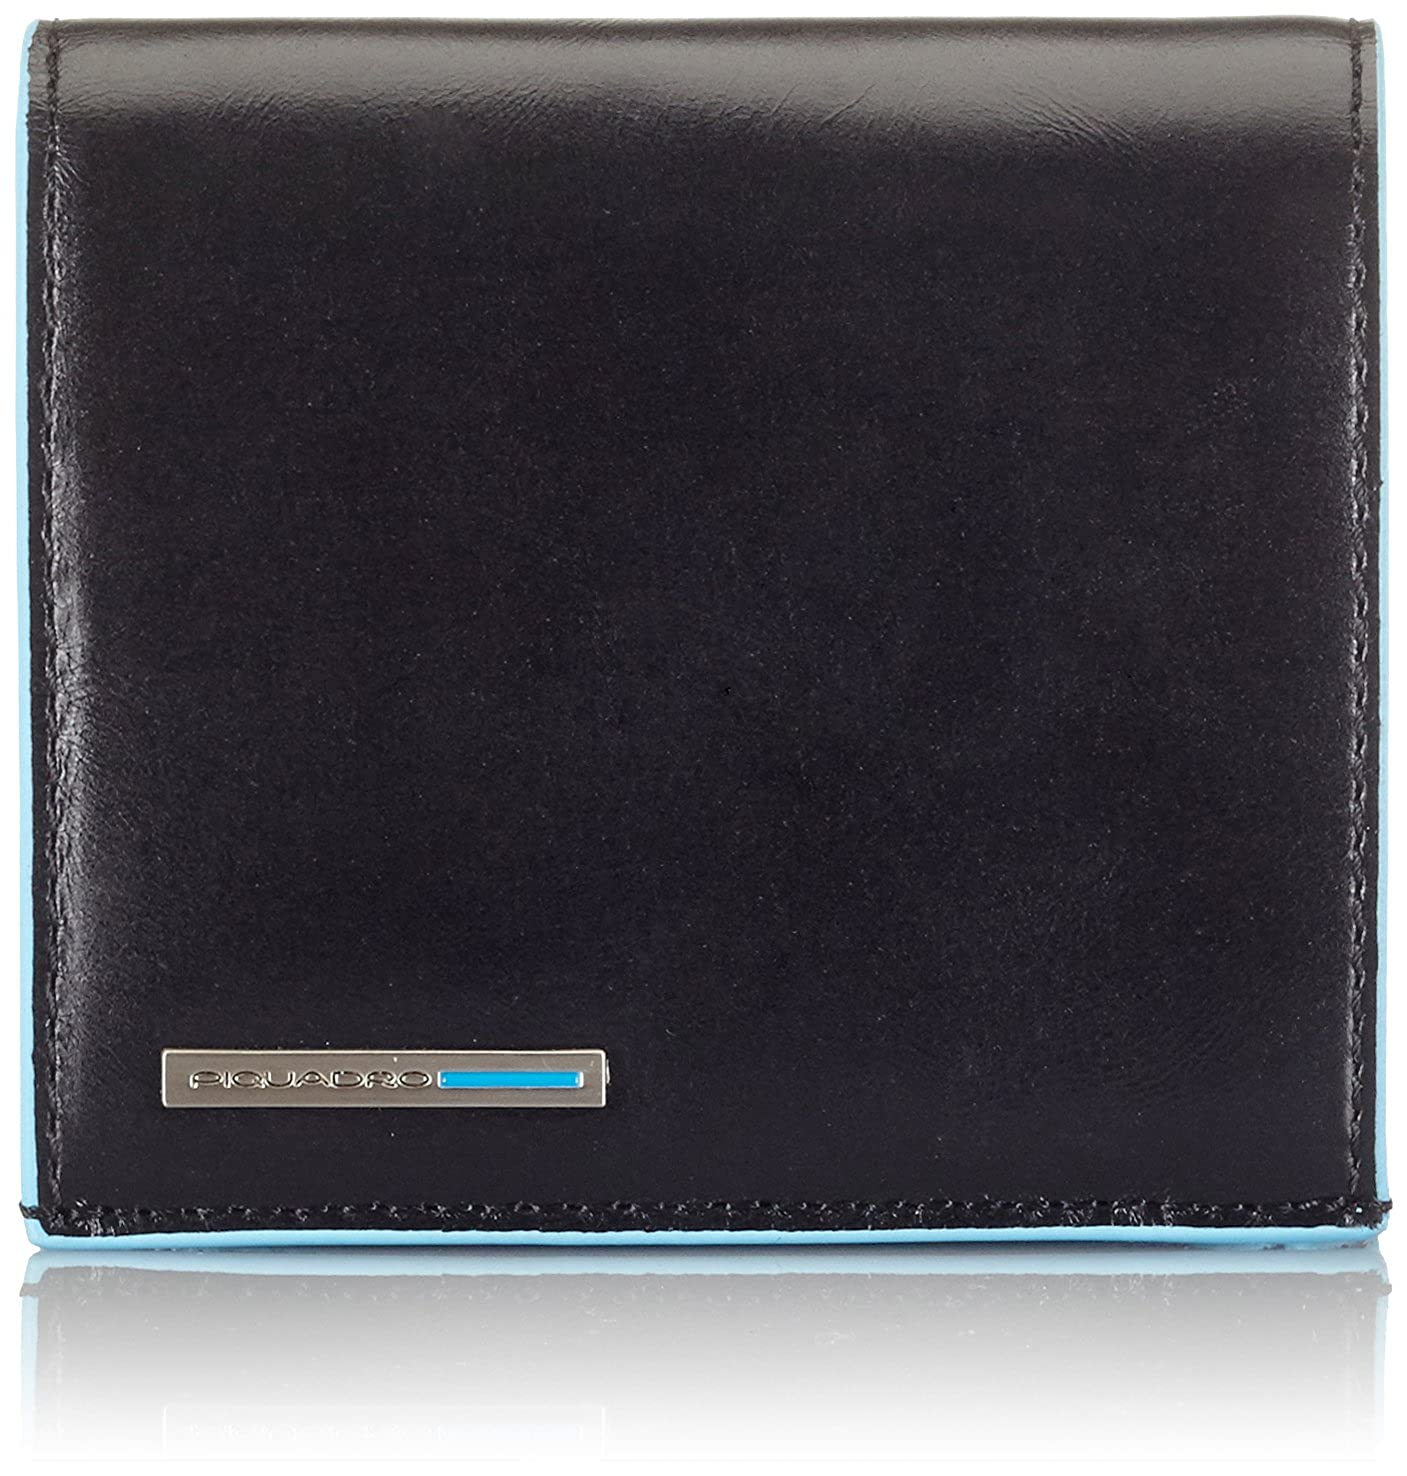 Piquadro Blue Square Hochformatbörse 4KK Piquadro Münzbörse Mogano (braun) - PU1741B2 PU1741B2/MO